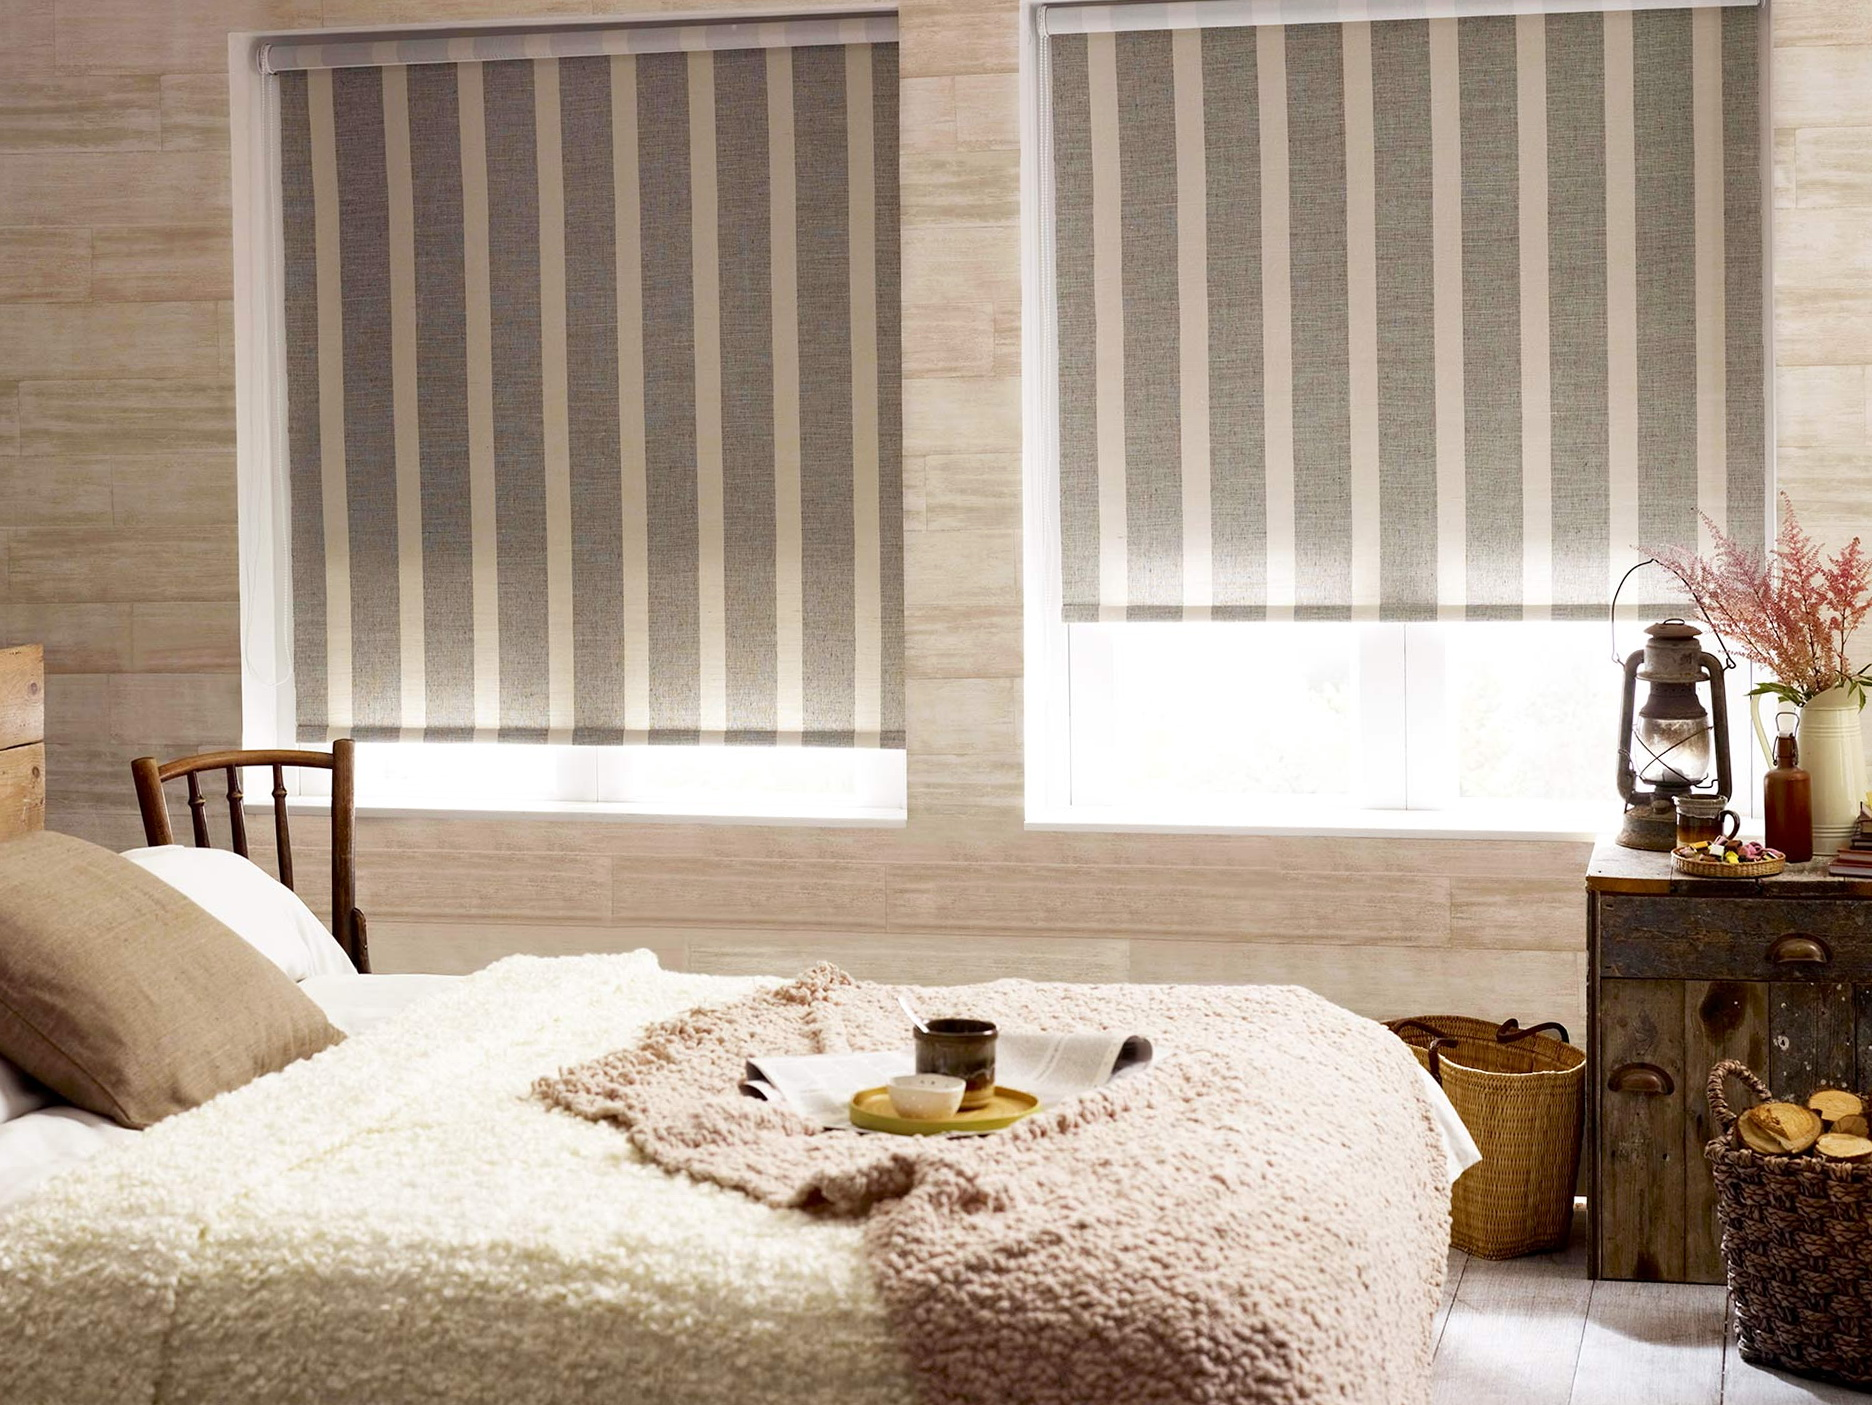 Blinds Vs Curtains Heat Home Design Ideas